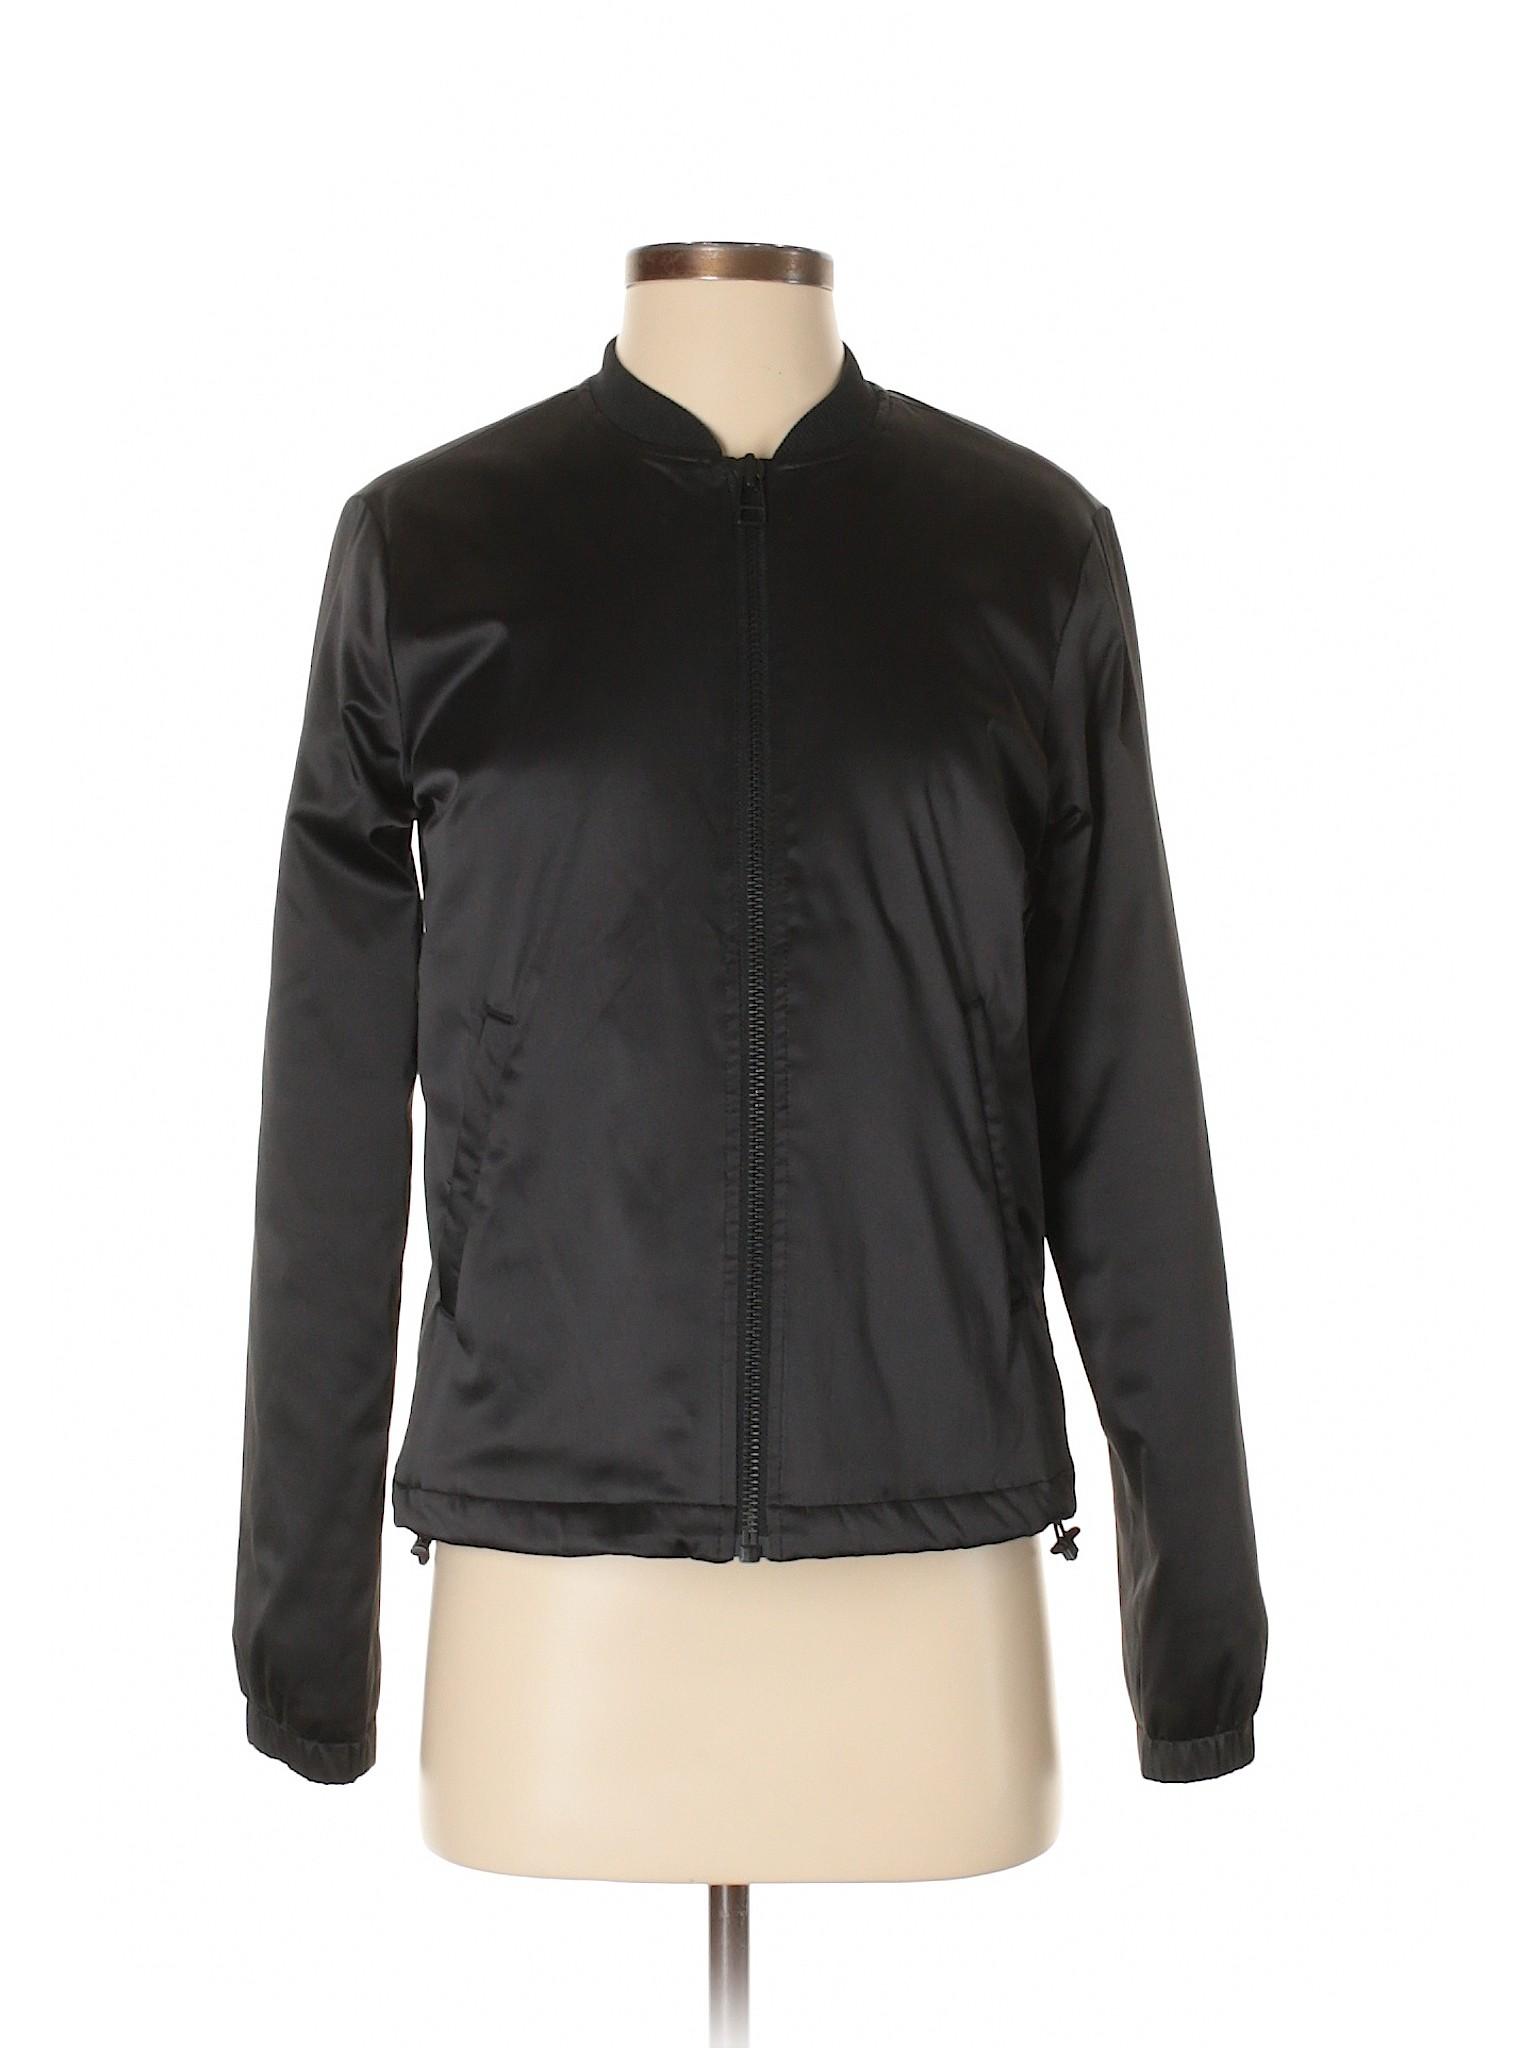 Jacket Leisure winter 10C Derek Athleta Lam ZnF4qRUA